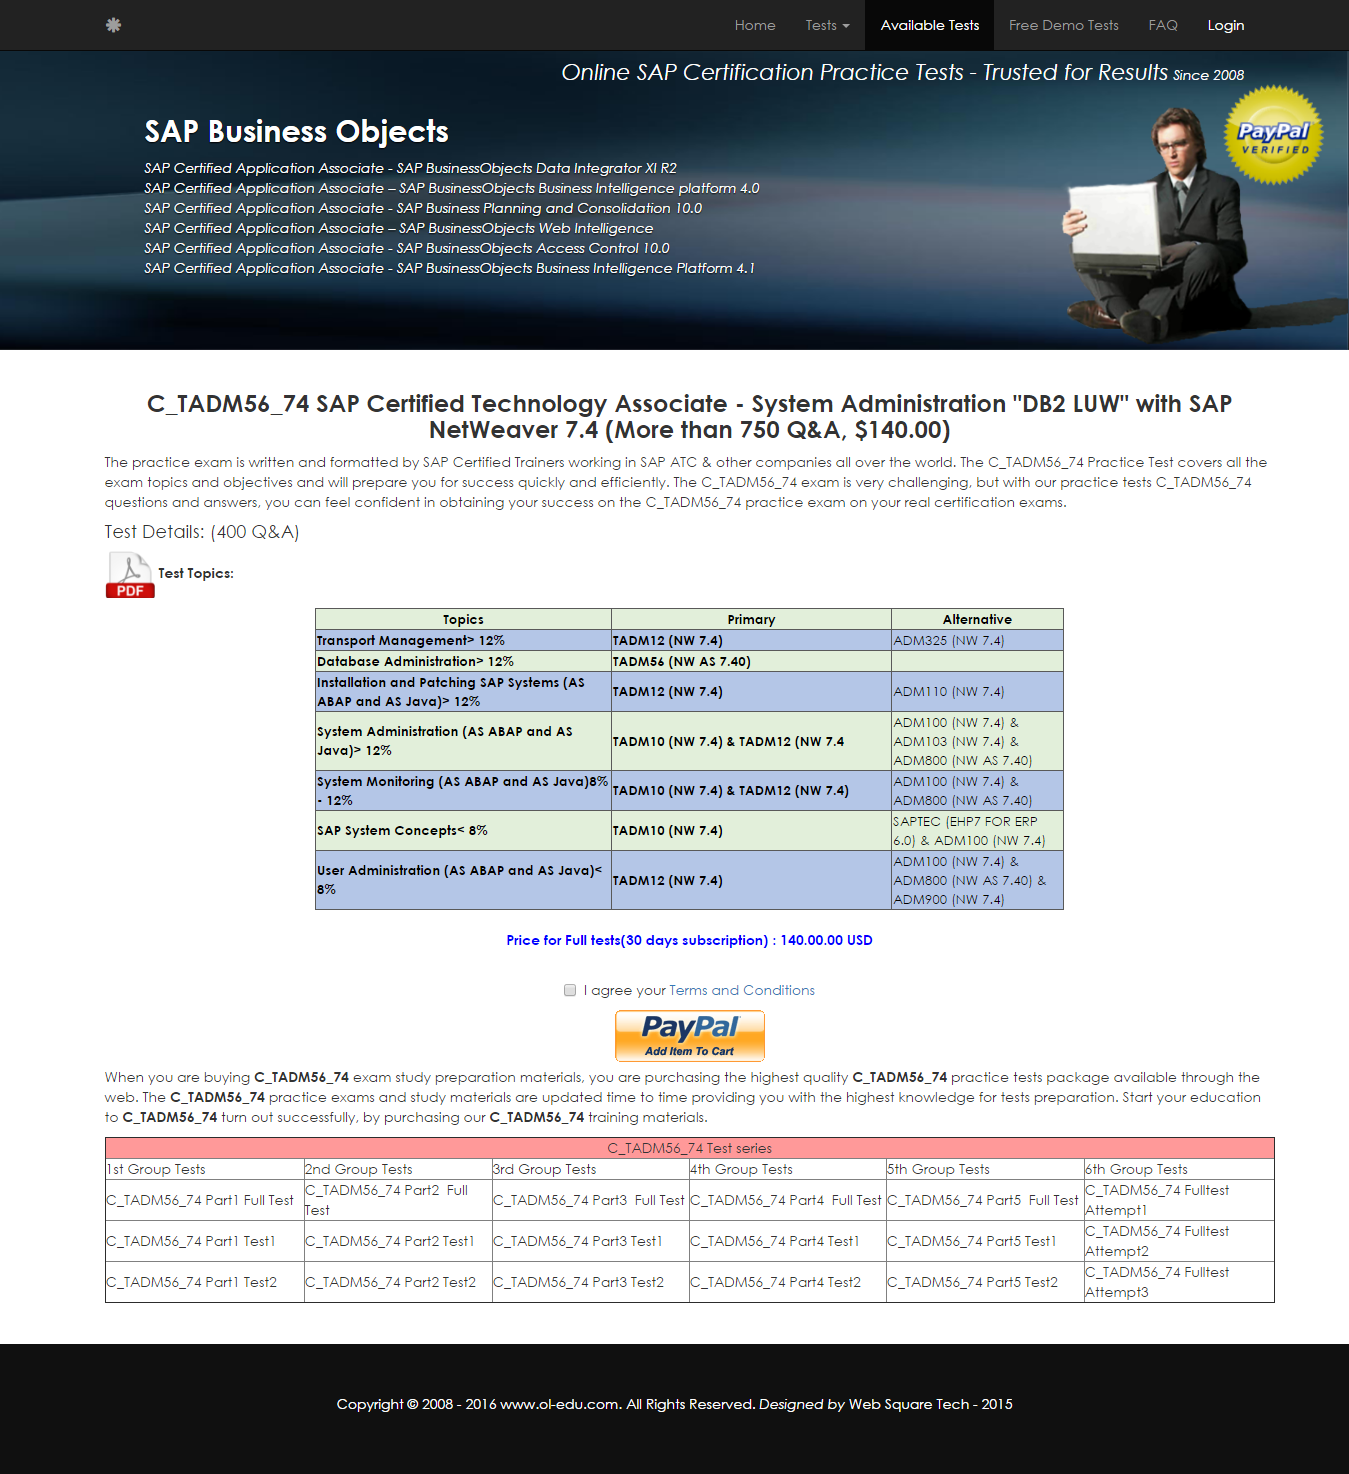 C_TADM56_74 | C_TADM56_74 - SAP Certified Technology